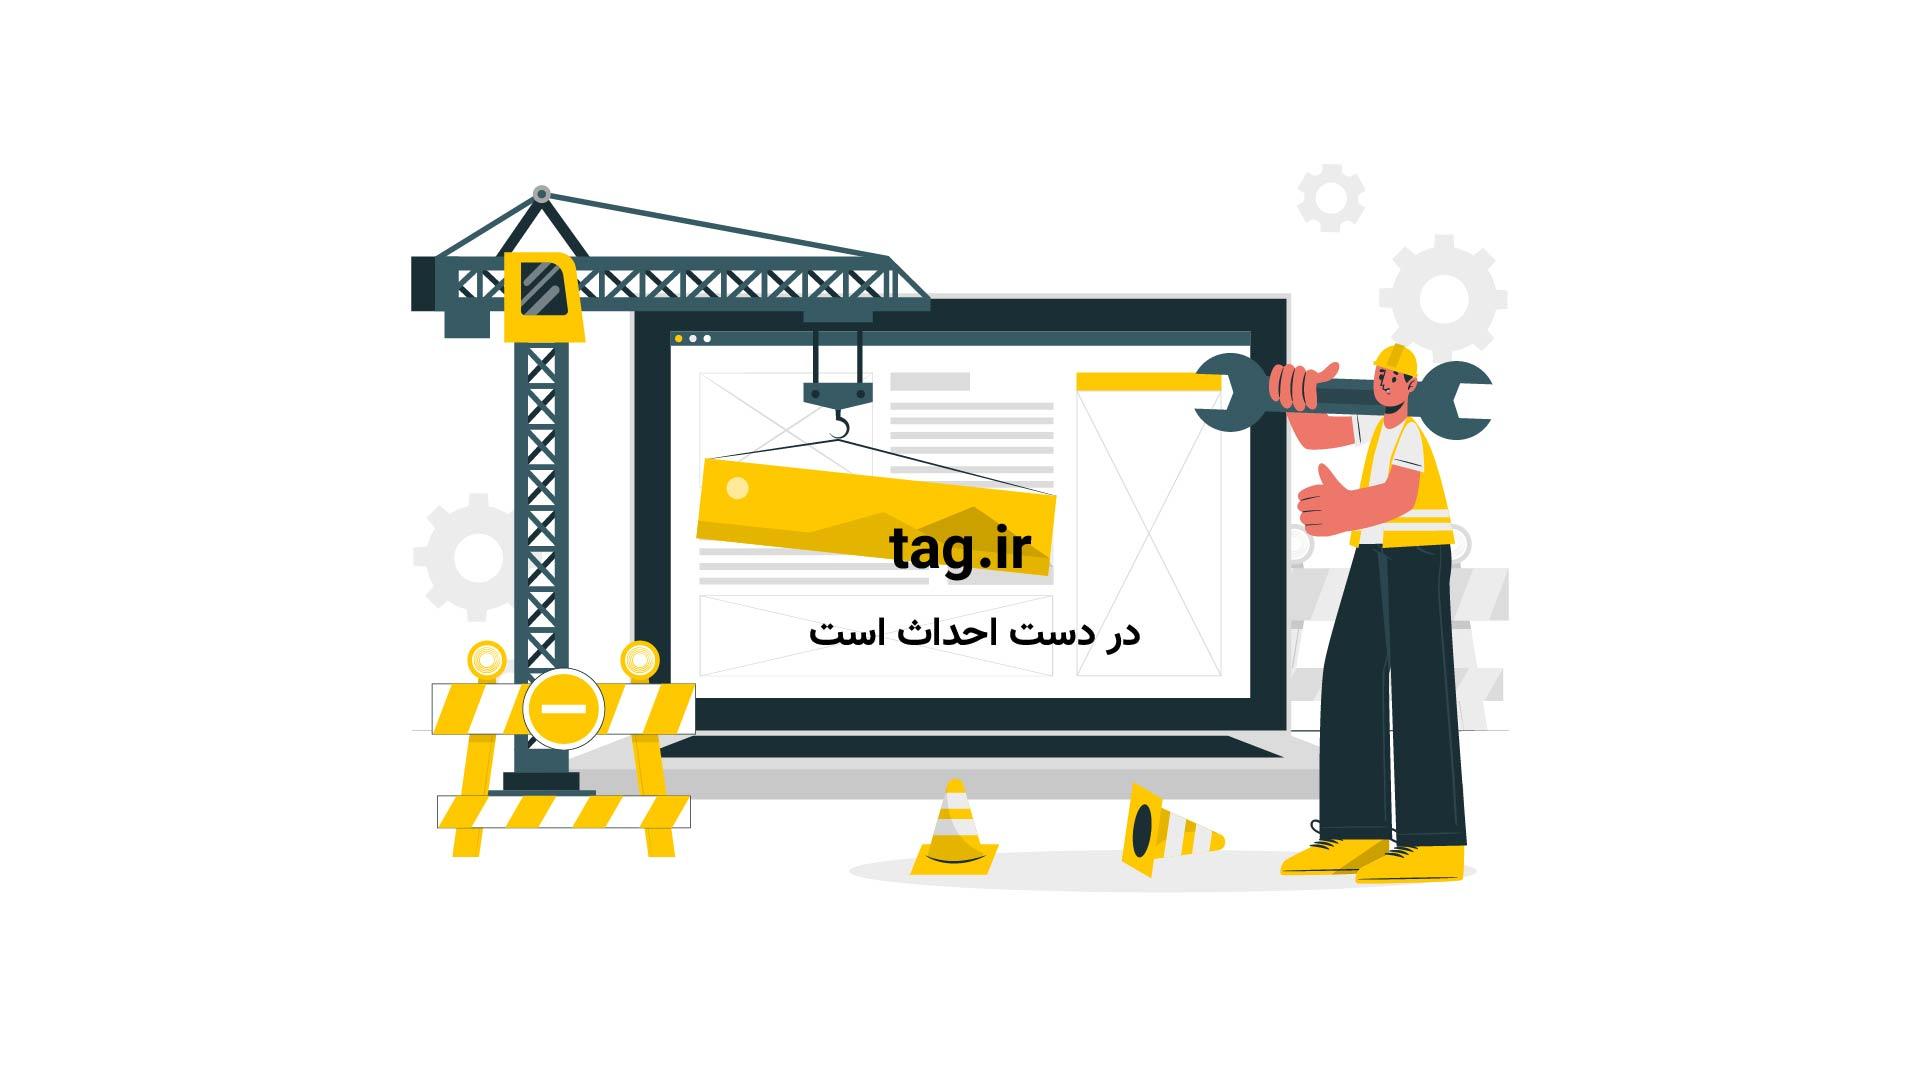 بازی بسکتبال ساکرامنتو کینگز ۱۱۵ – ۱۲۱ لس آنجلس کلیپرز | فیلم